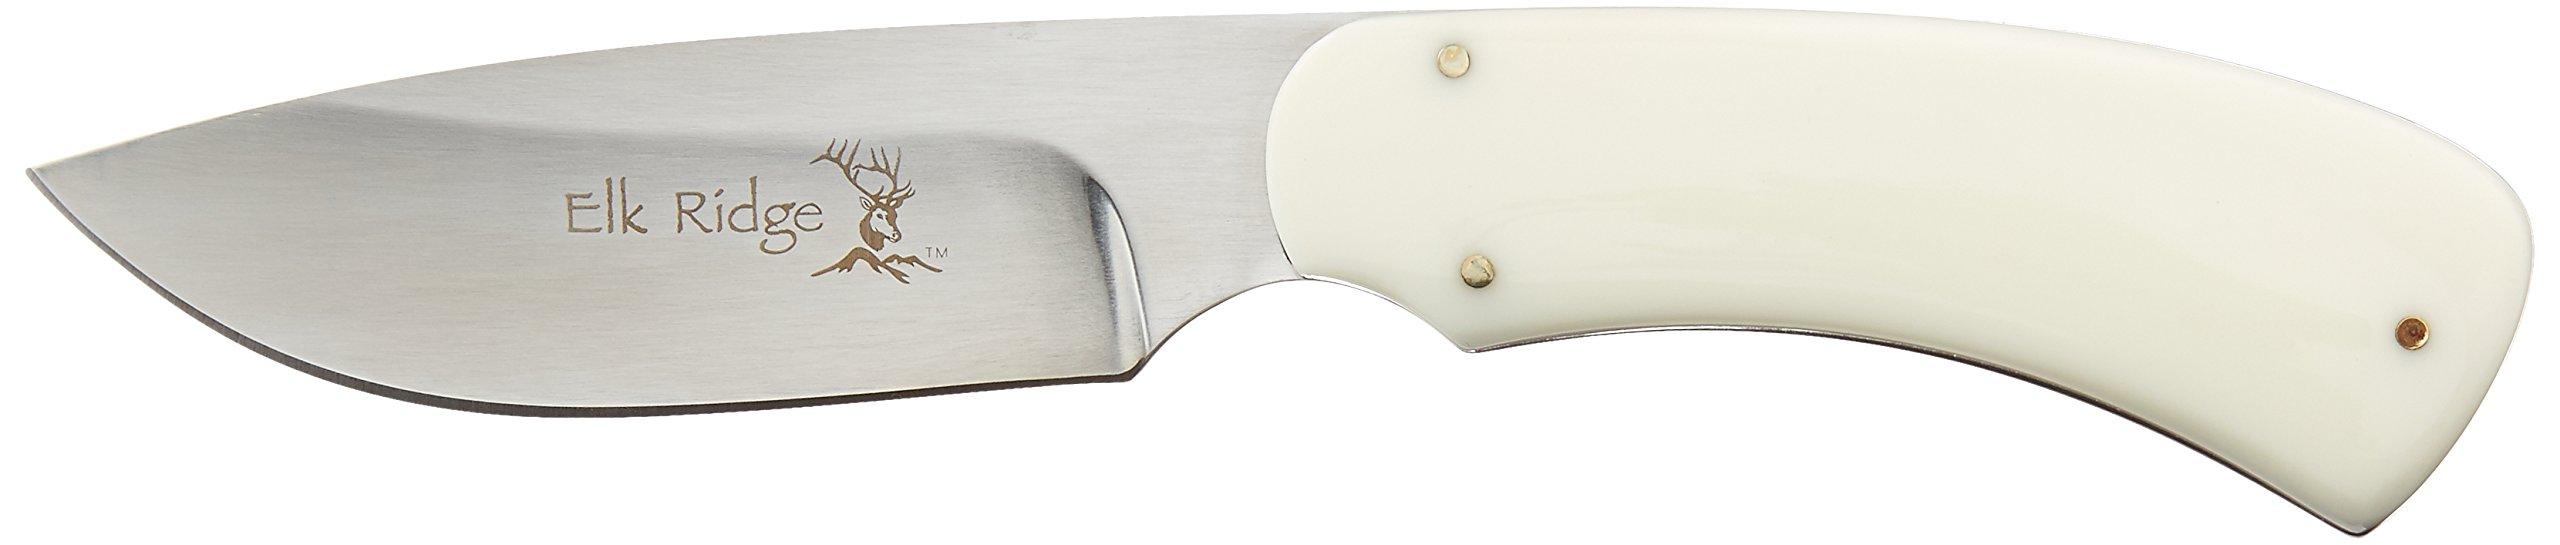 Elk Ridge ER-149W Outdoor Fixed Blade Knife 7.75-Inch Overall